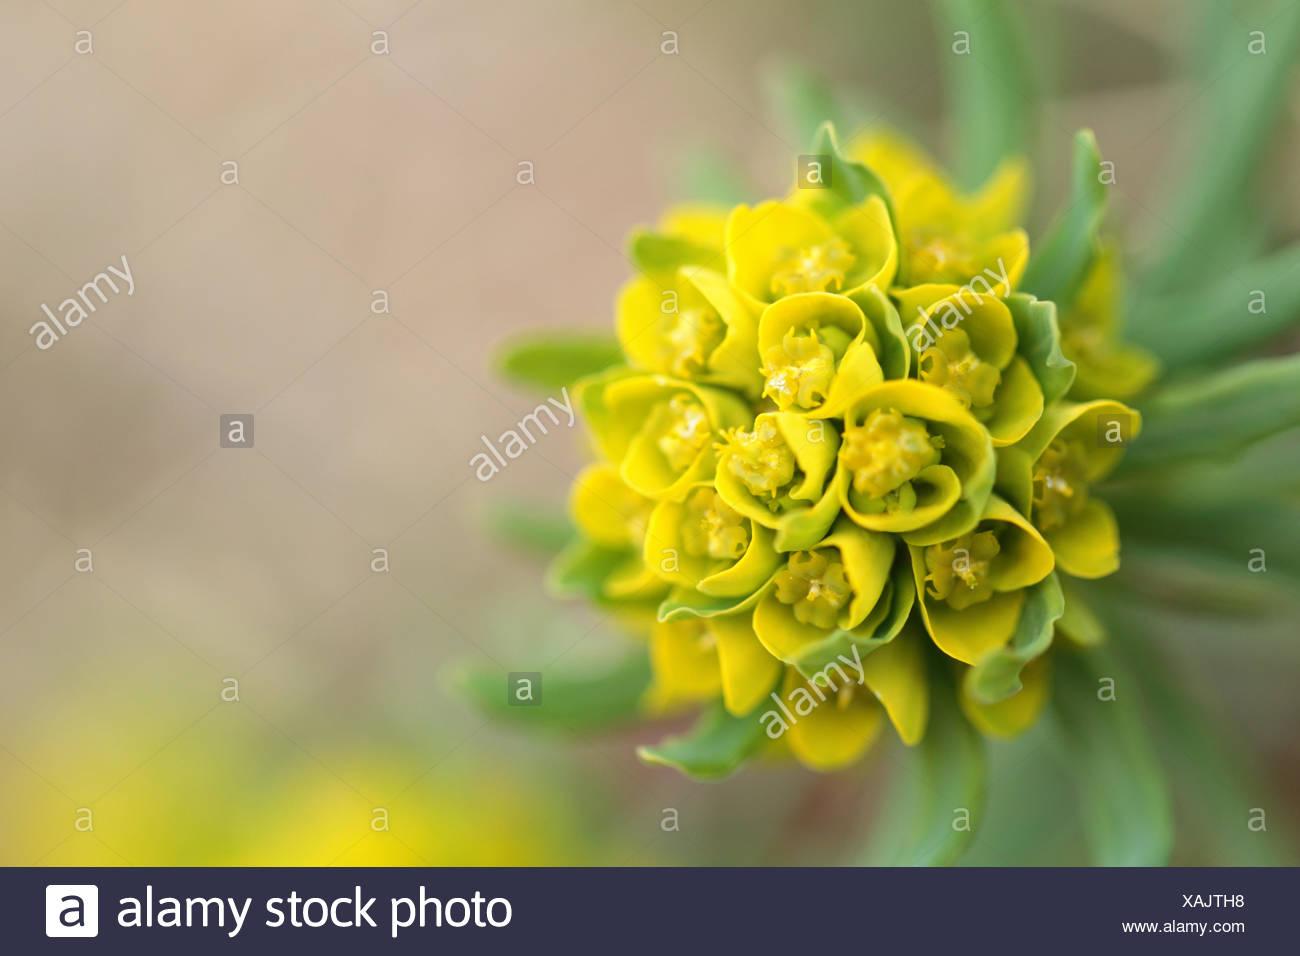 Cypress spurge, Euphorbia cyparissias, in soft focus. - Stock Image